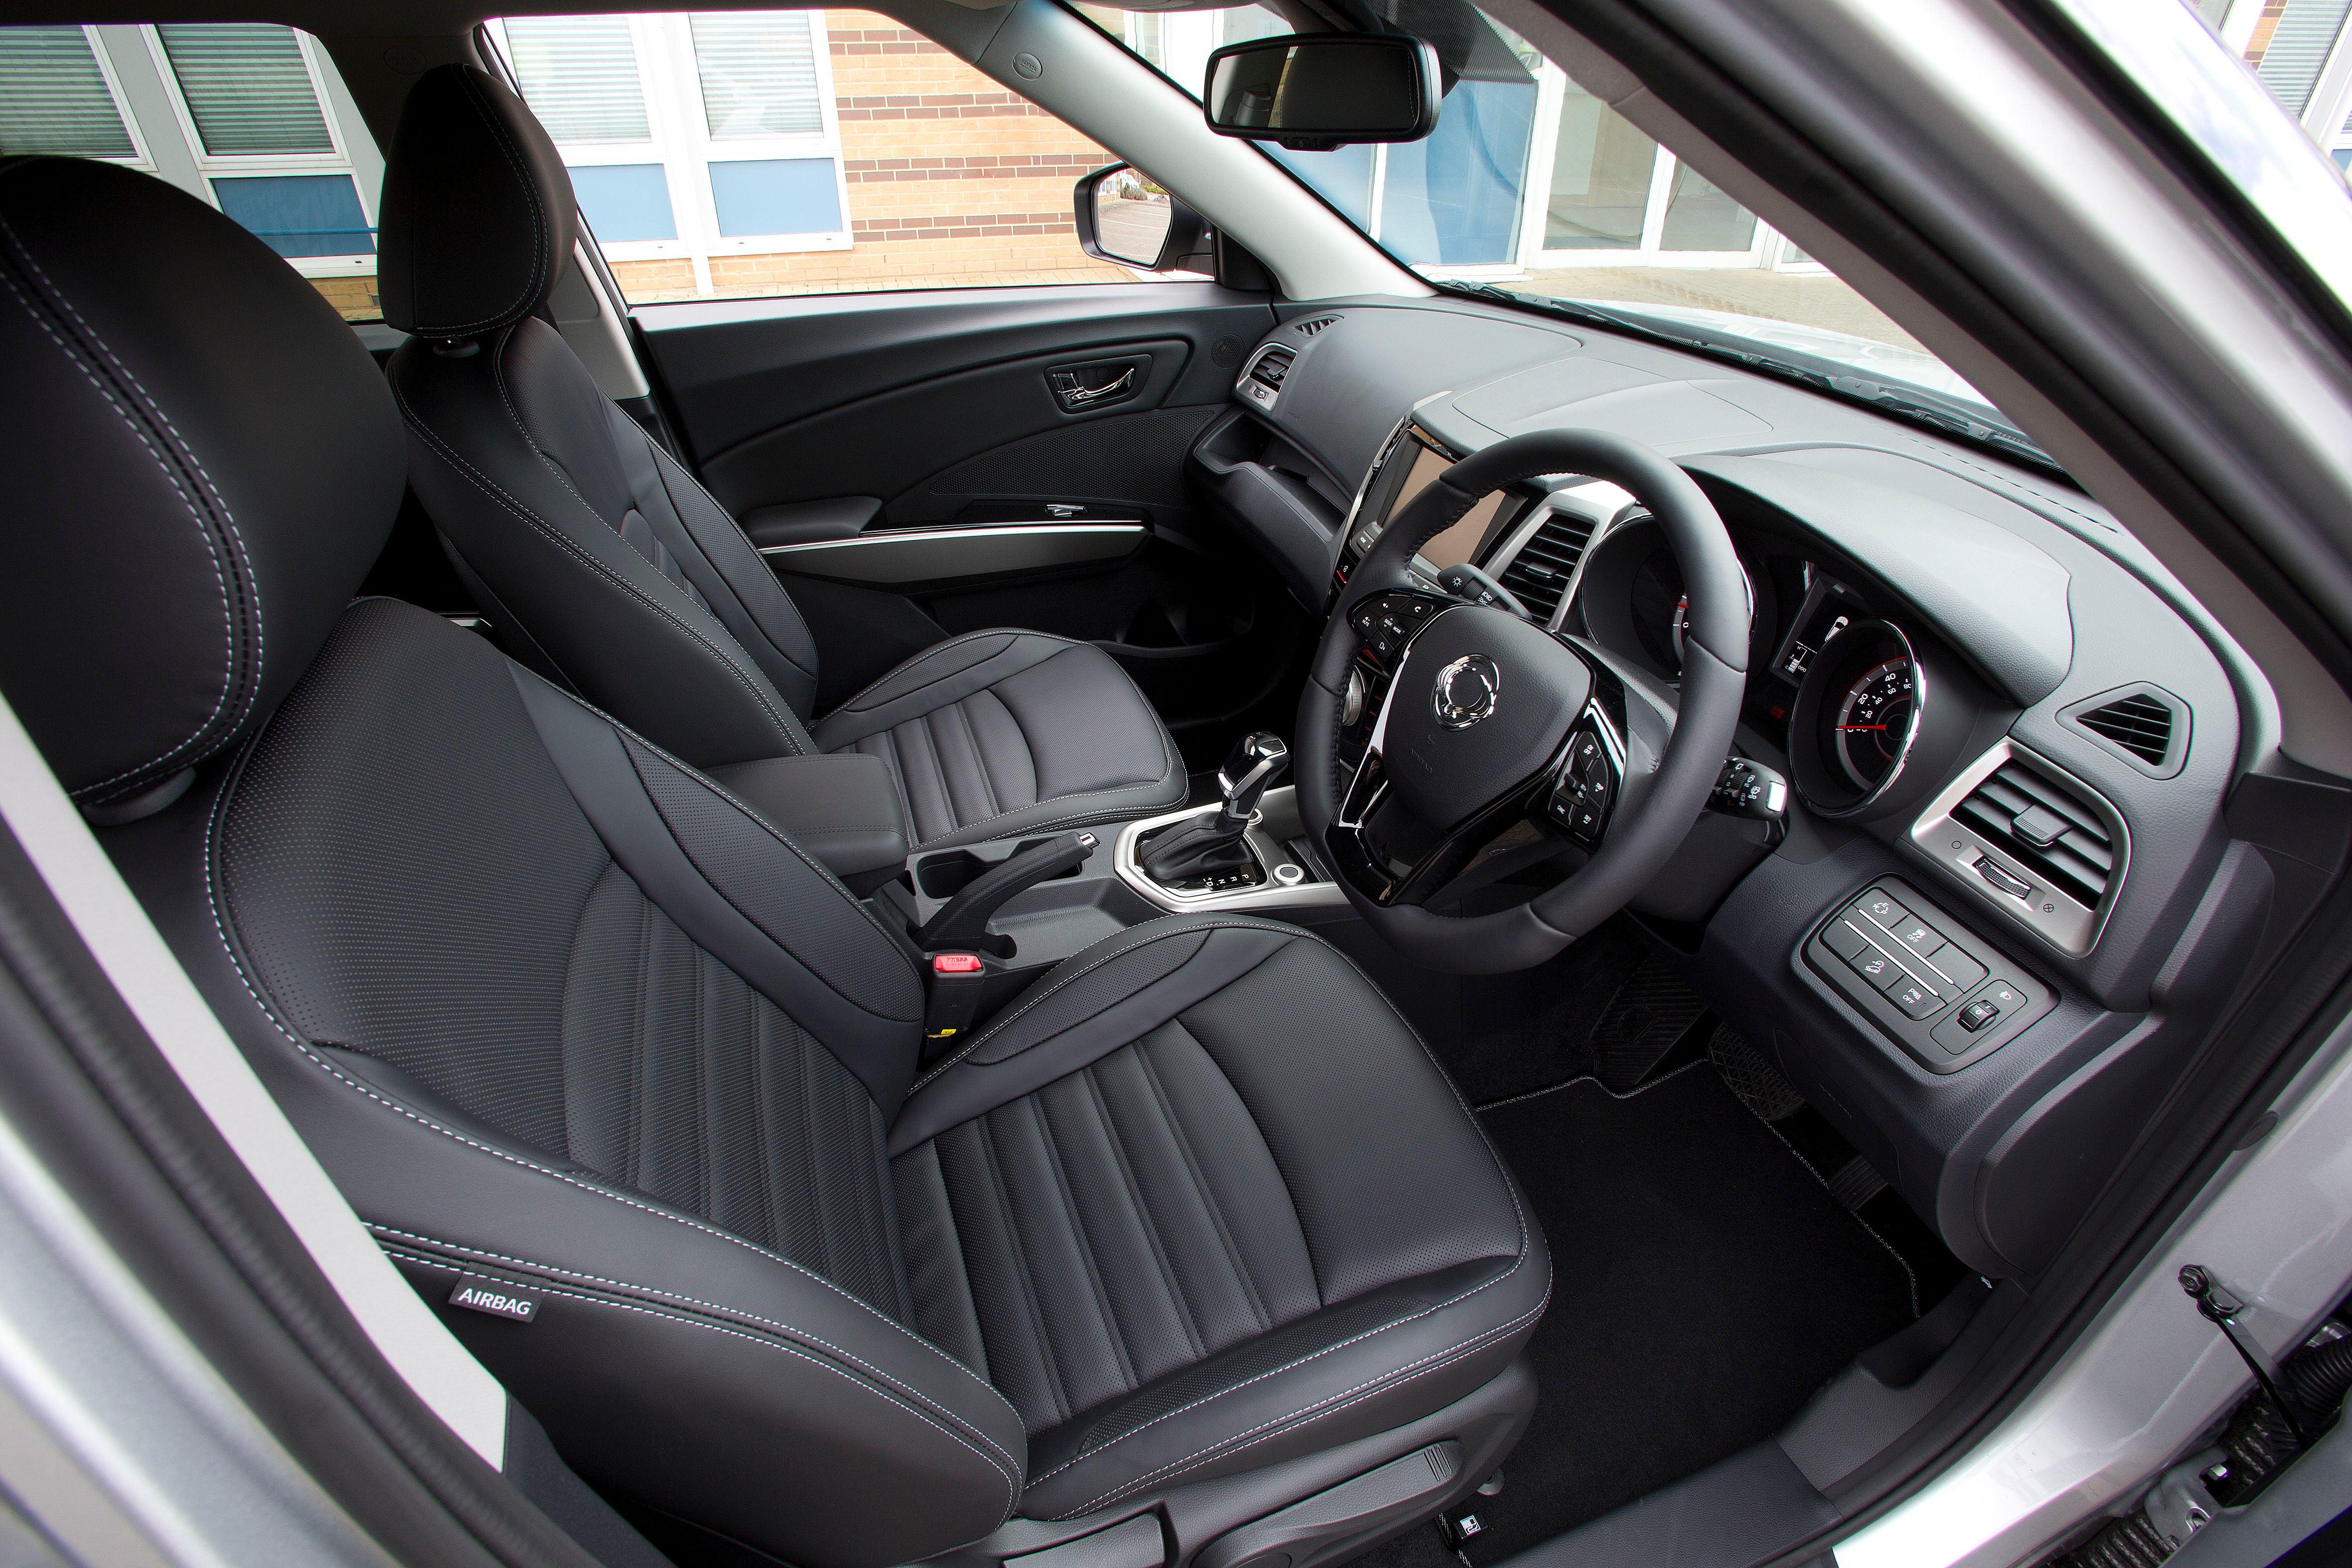 SsangYong Tivoli Front Car Seats